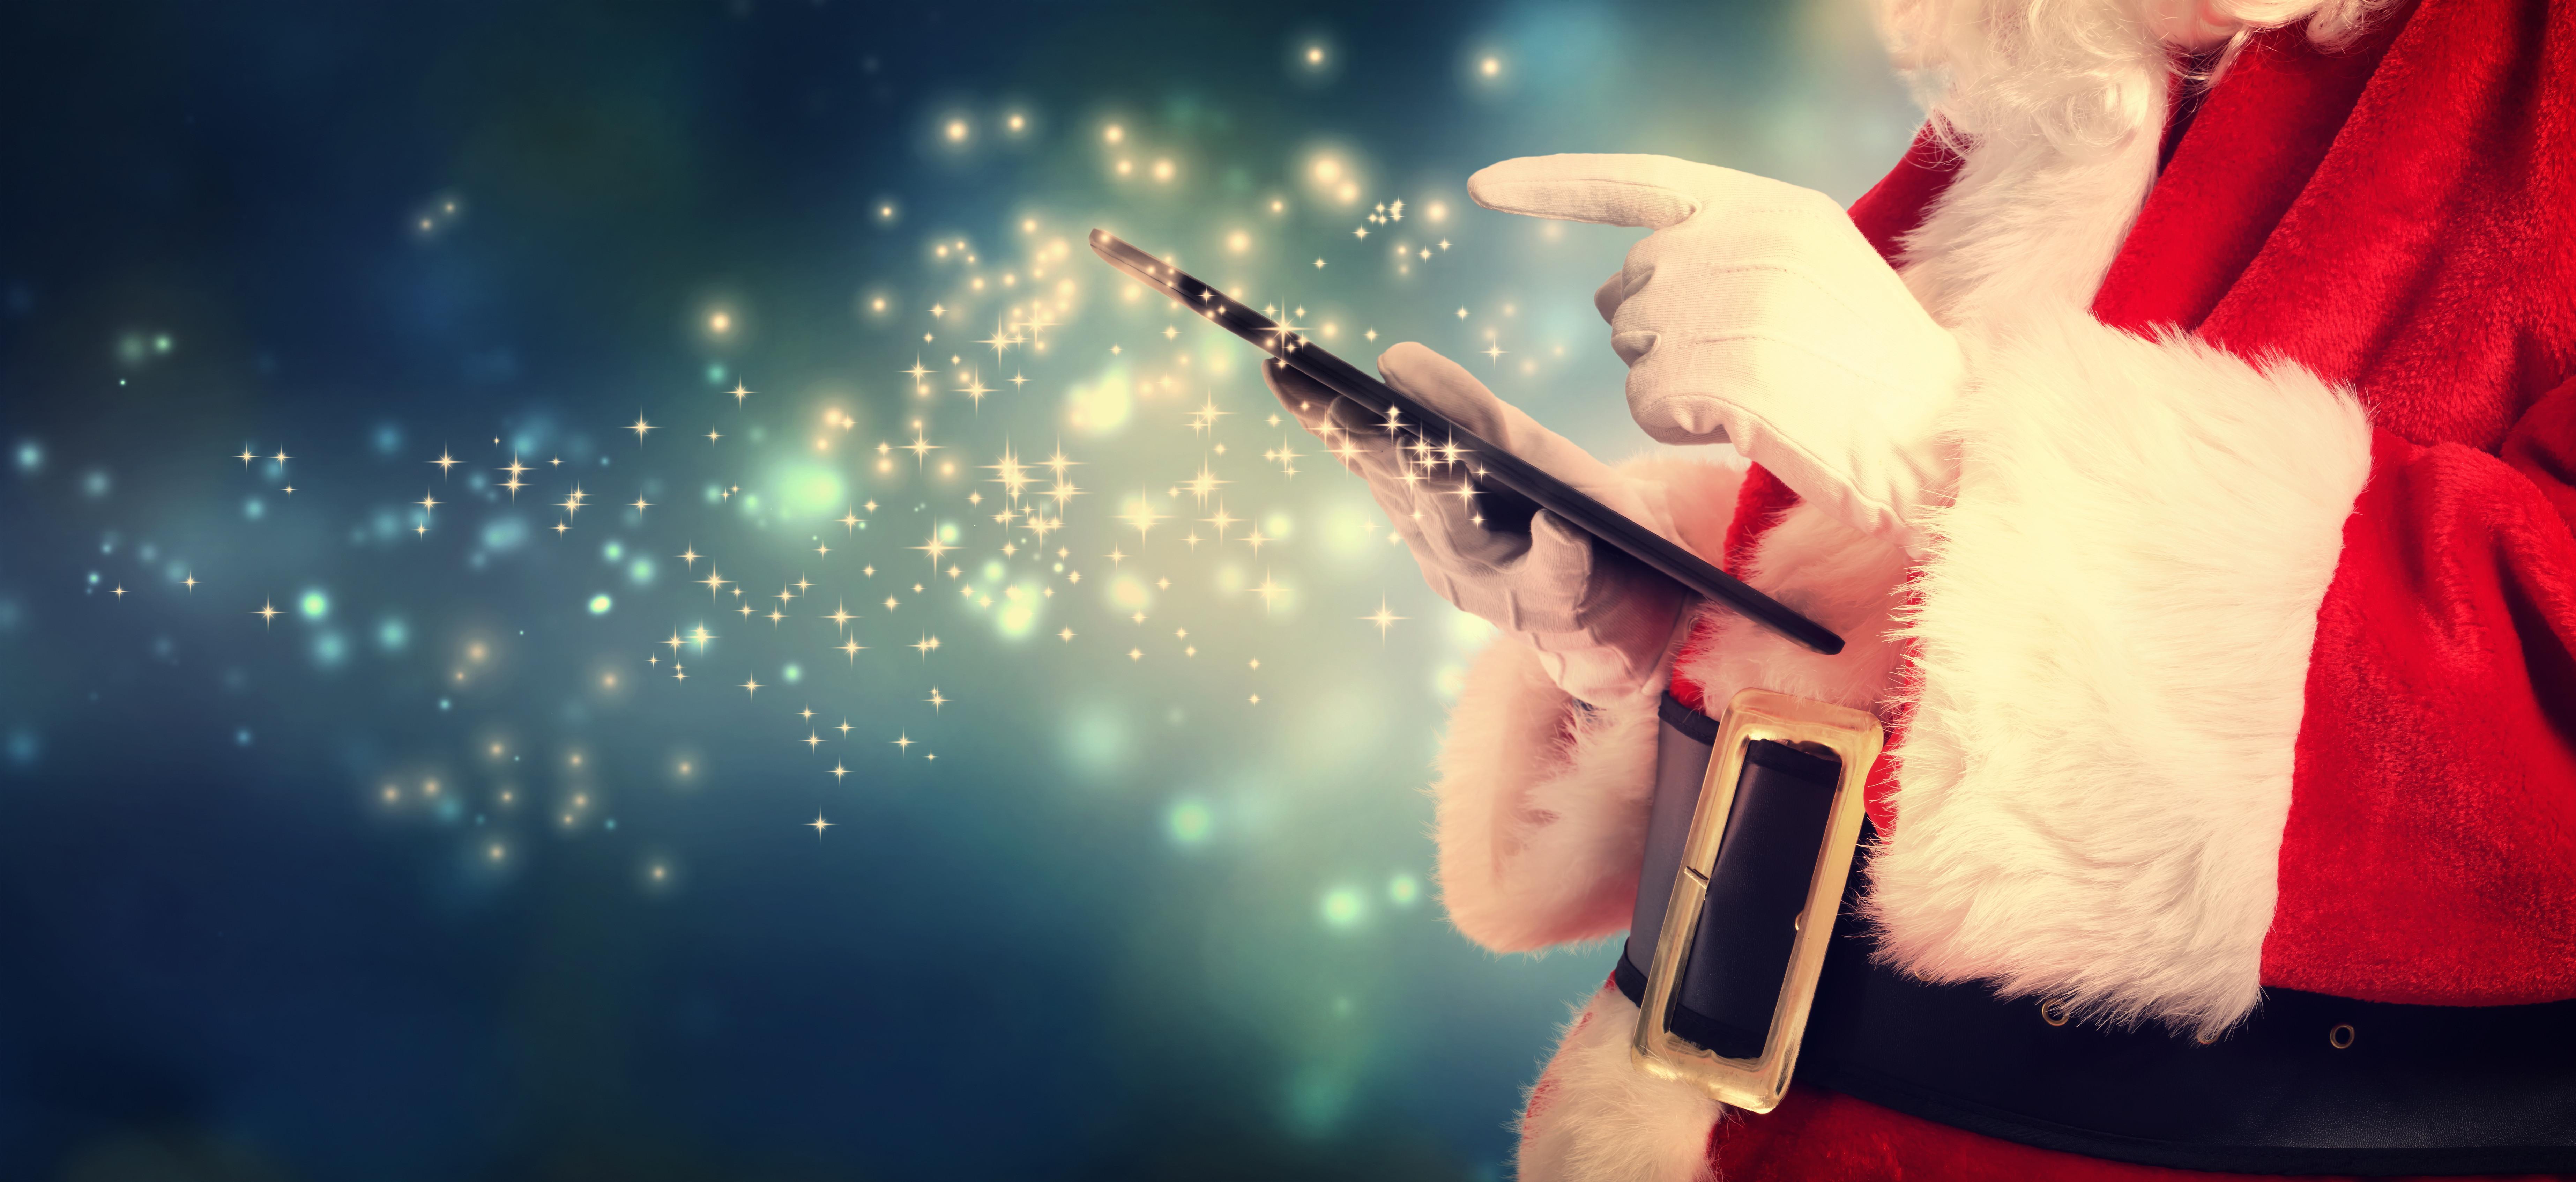 Phone Call with Santa